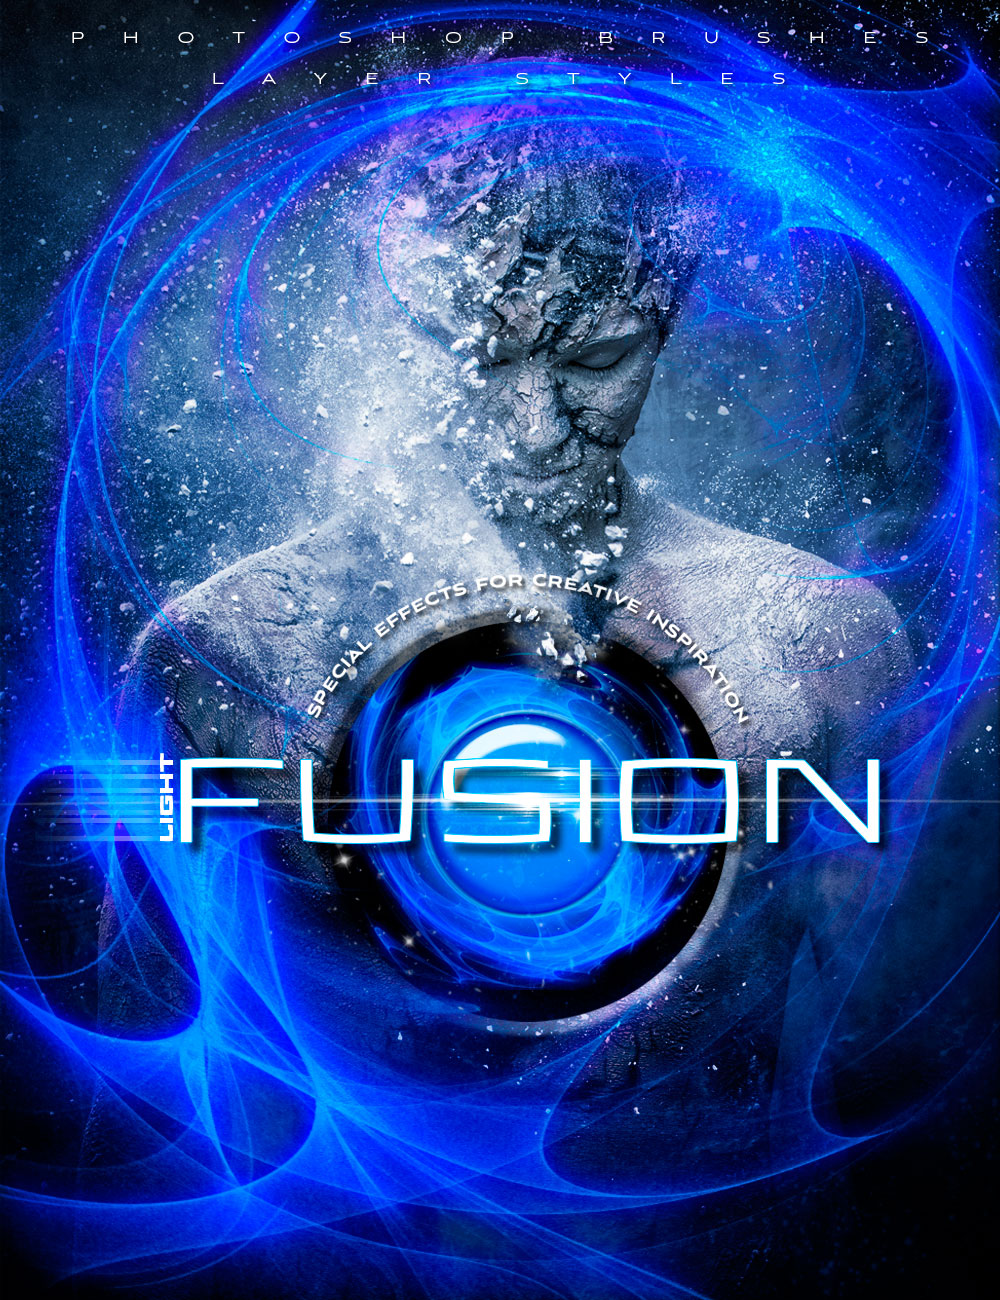 Ron's Light Fusion by: deviney, 3D Models by Daz 3D